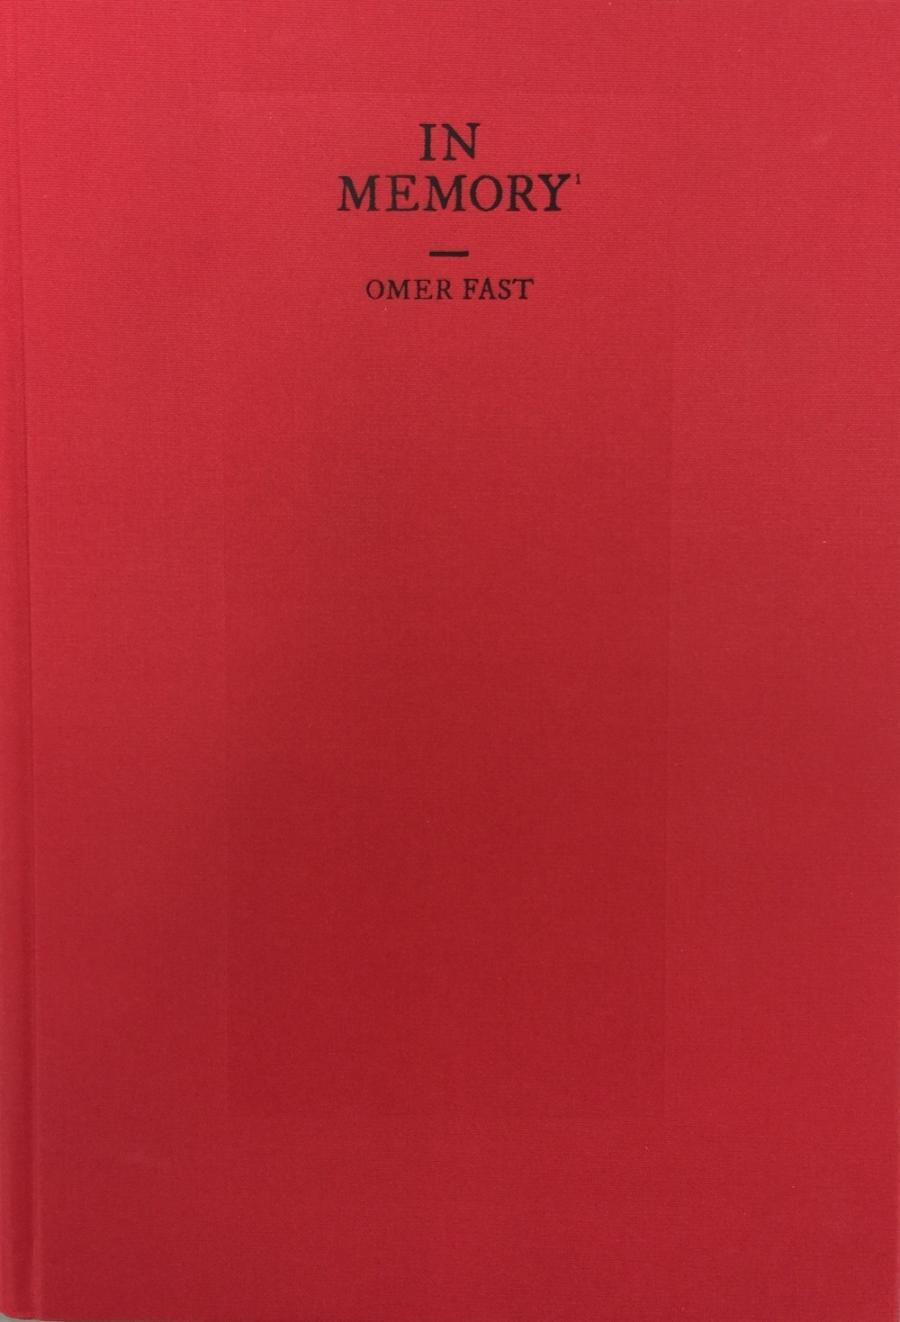 Omar Fast P